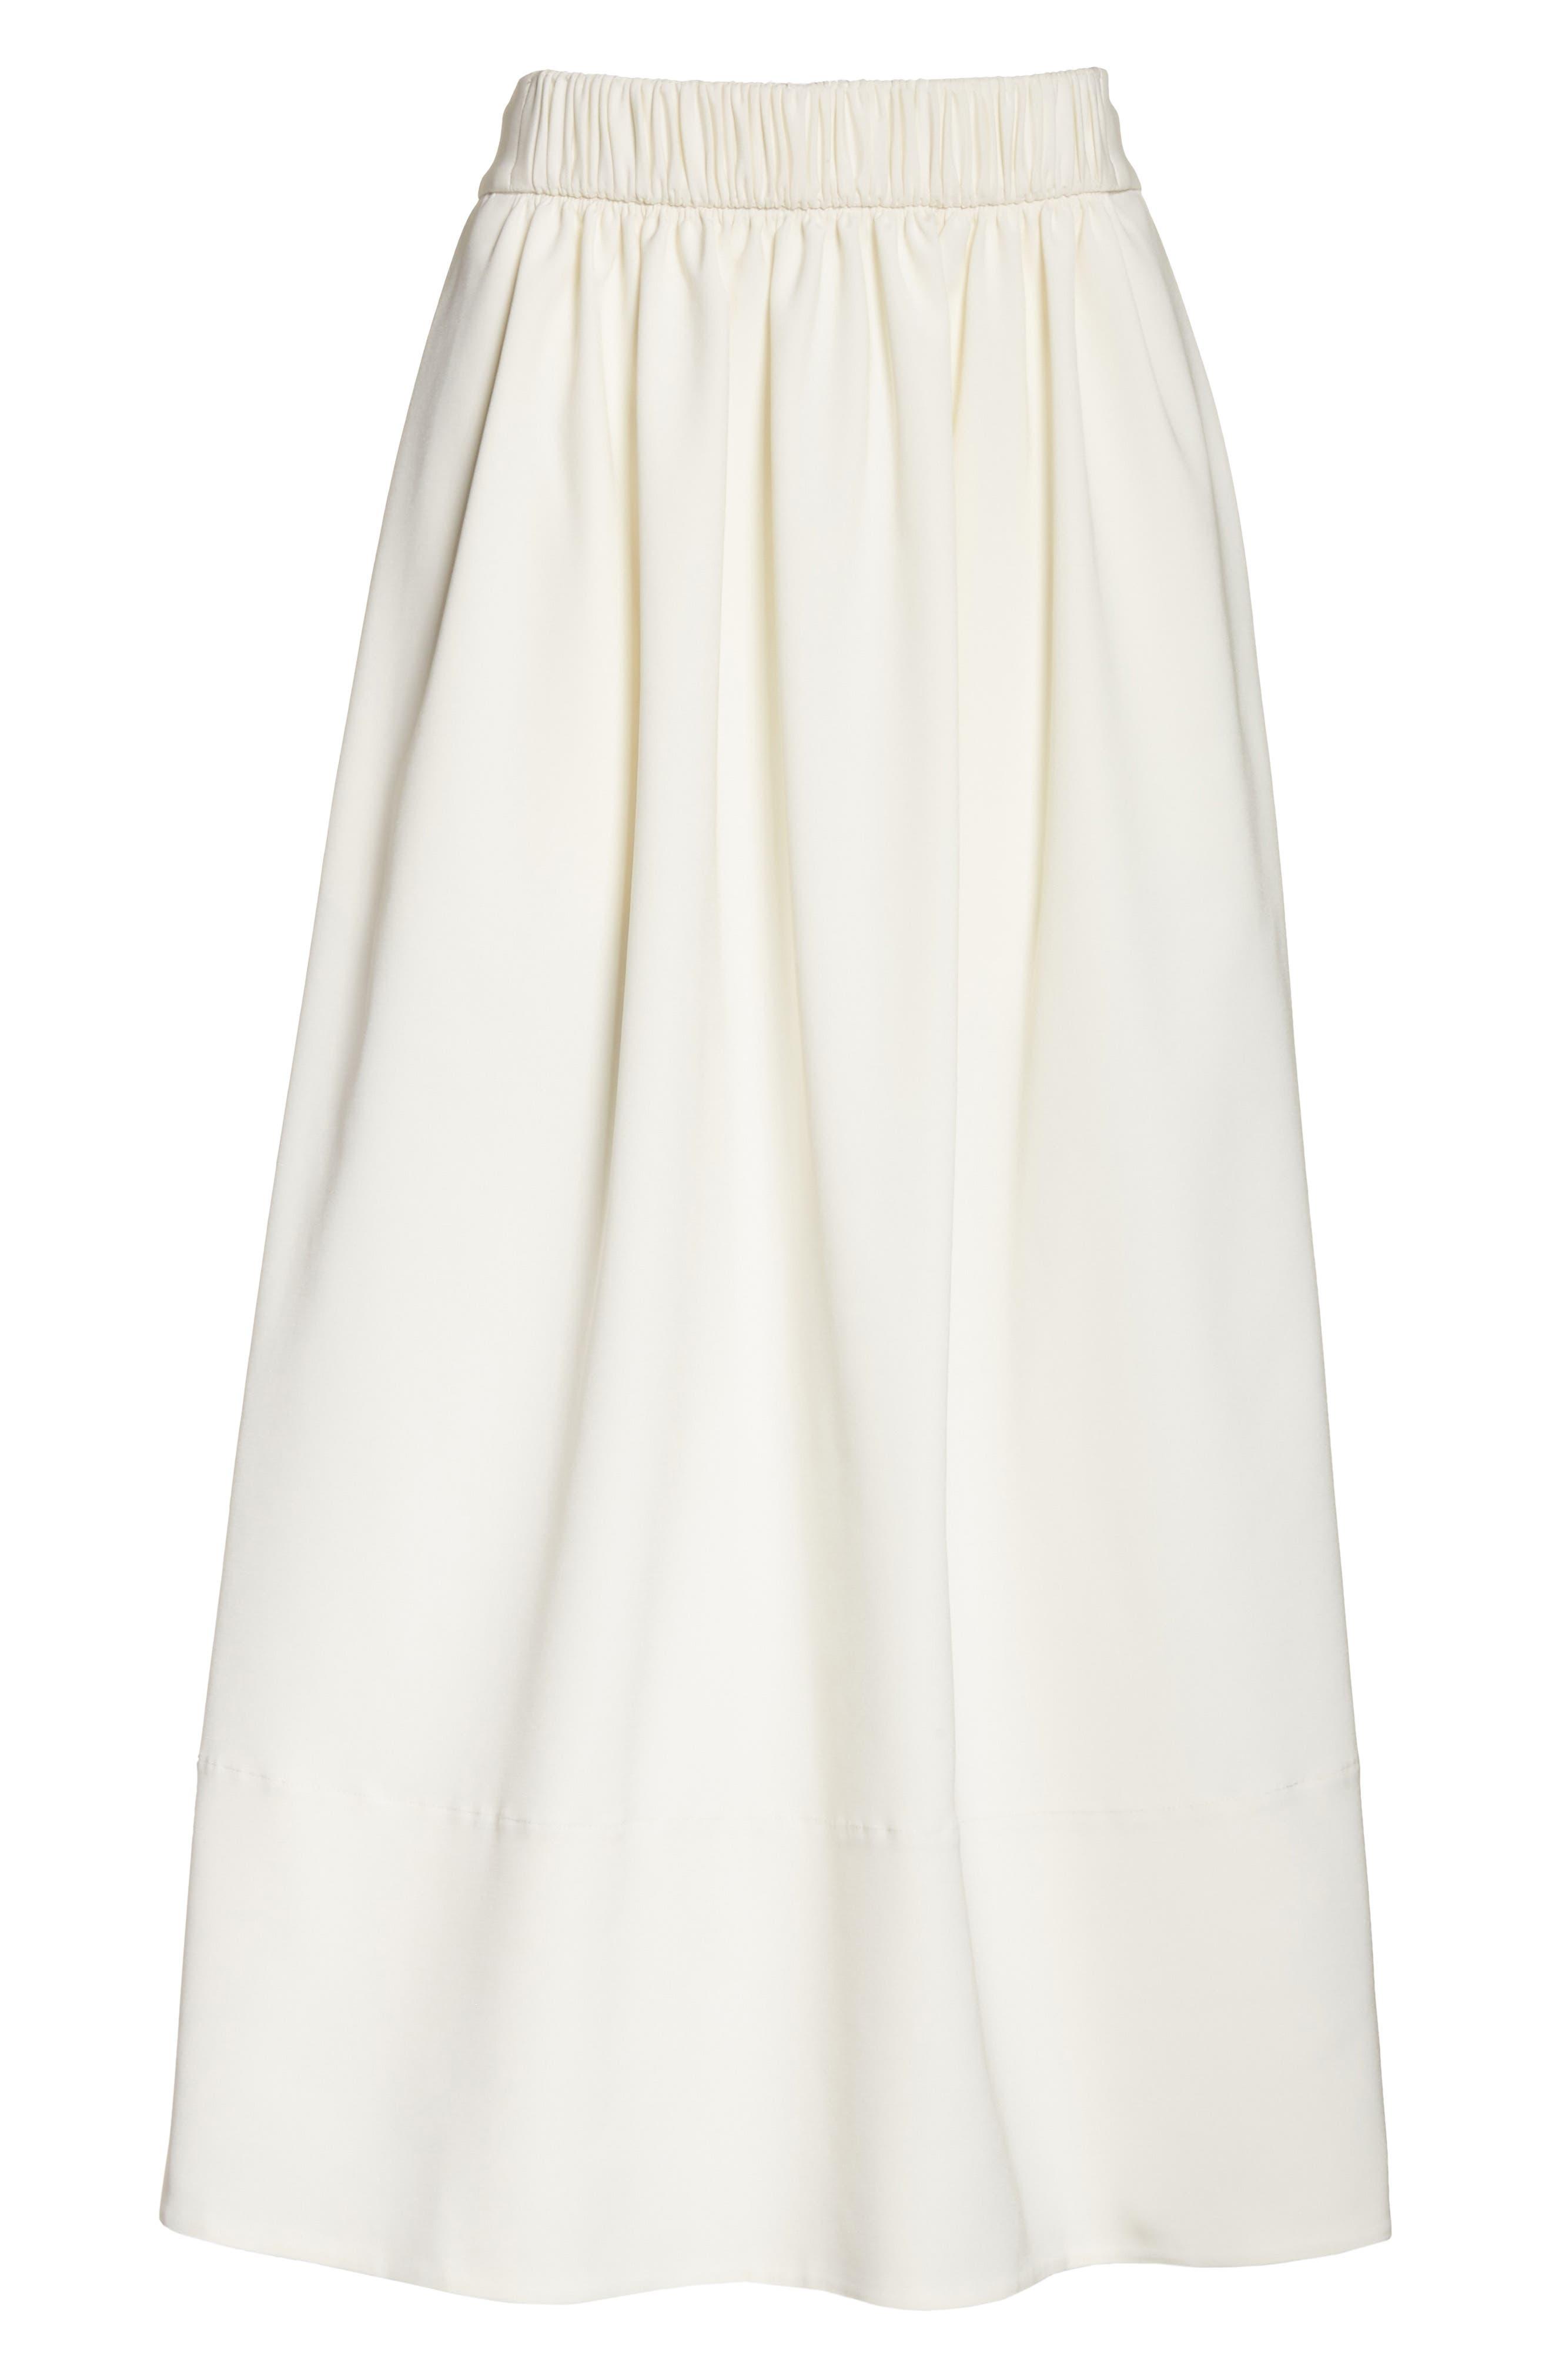 Stretch Faille Full Midi Skirt,                             Alternate thumbnail 6, color,                             904